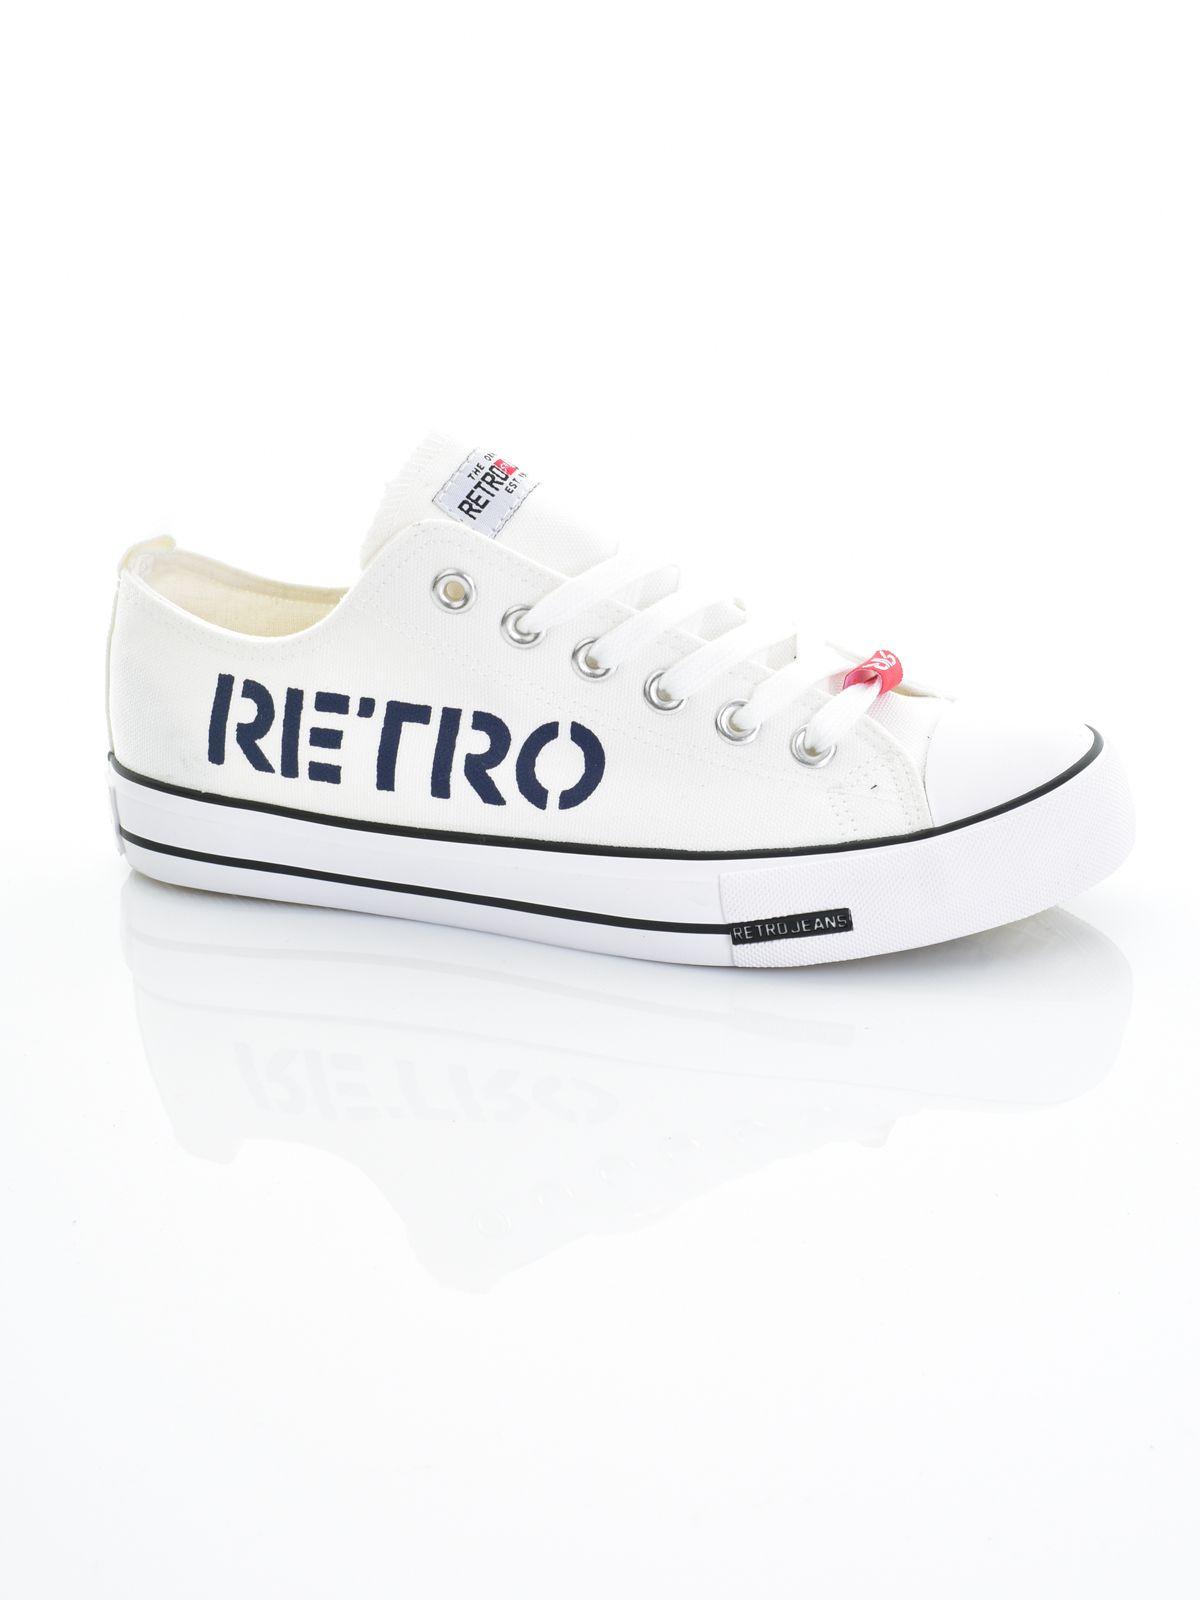 Retro Jeans férfi cipő CLAXTON PRINT SNEAKERS | Markasbolt